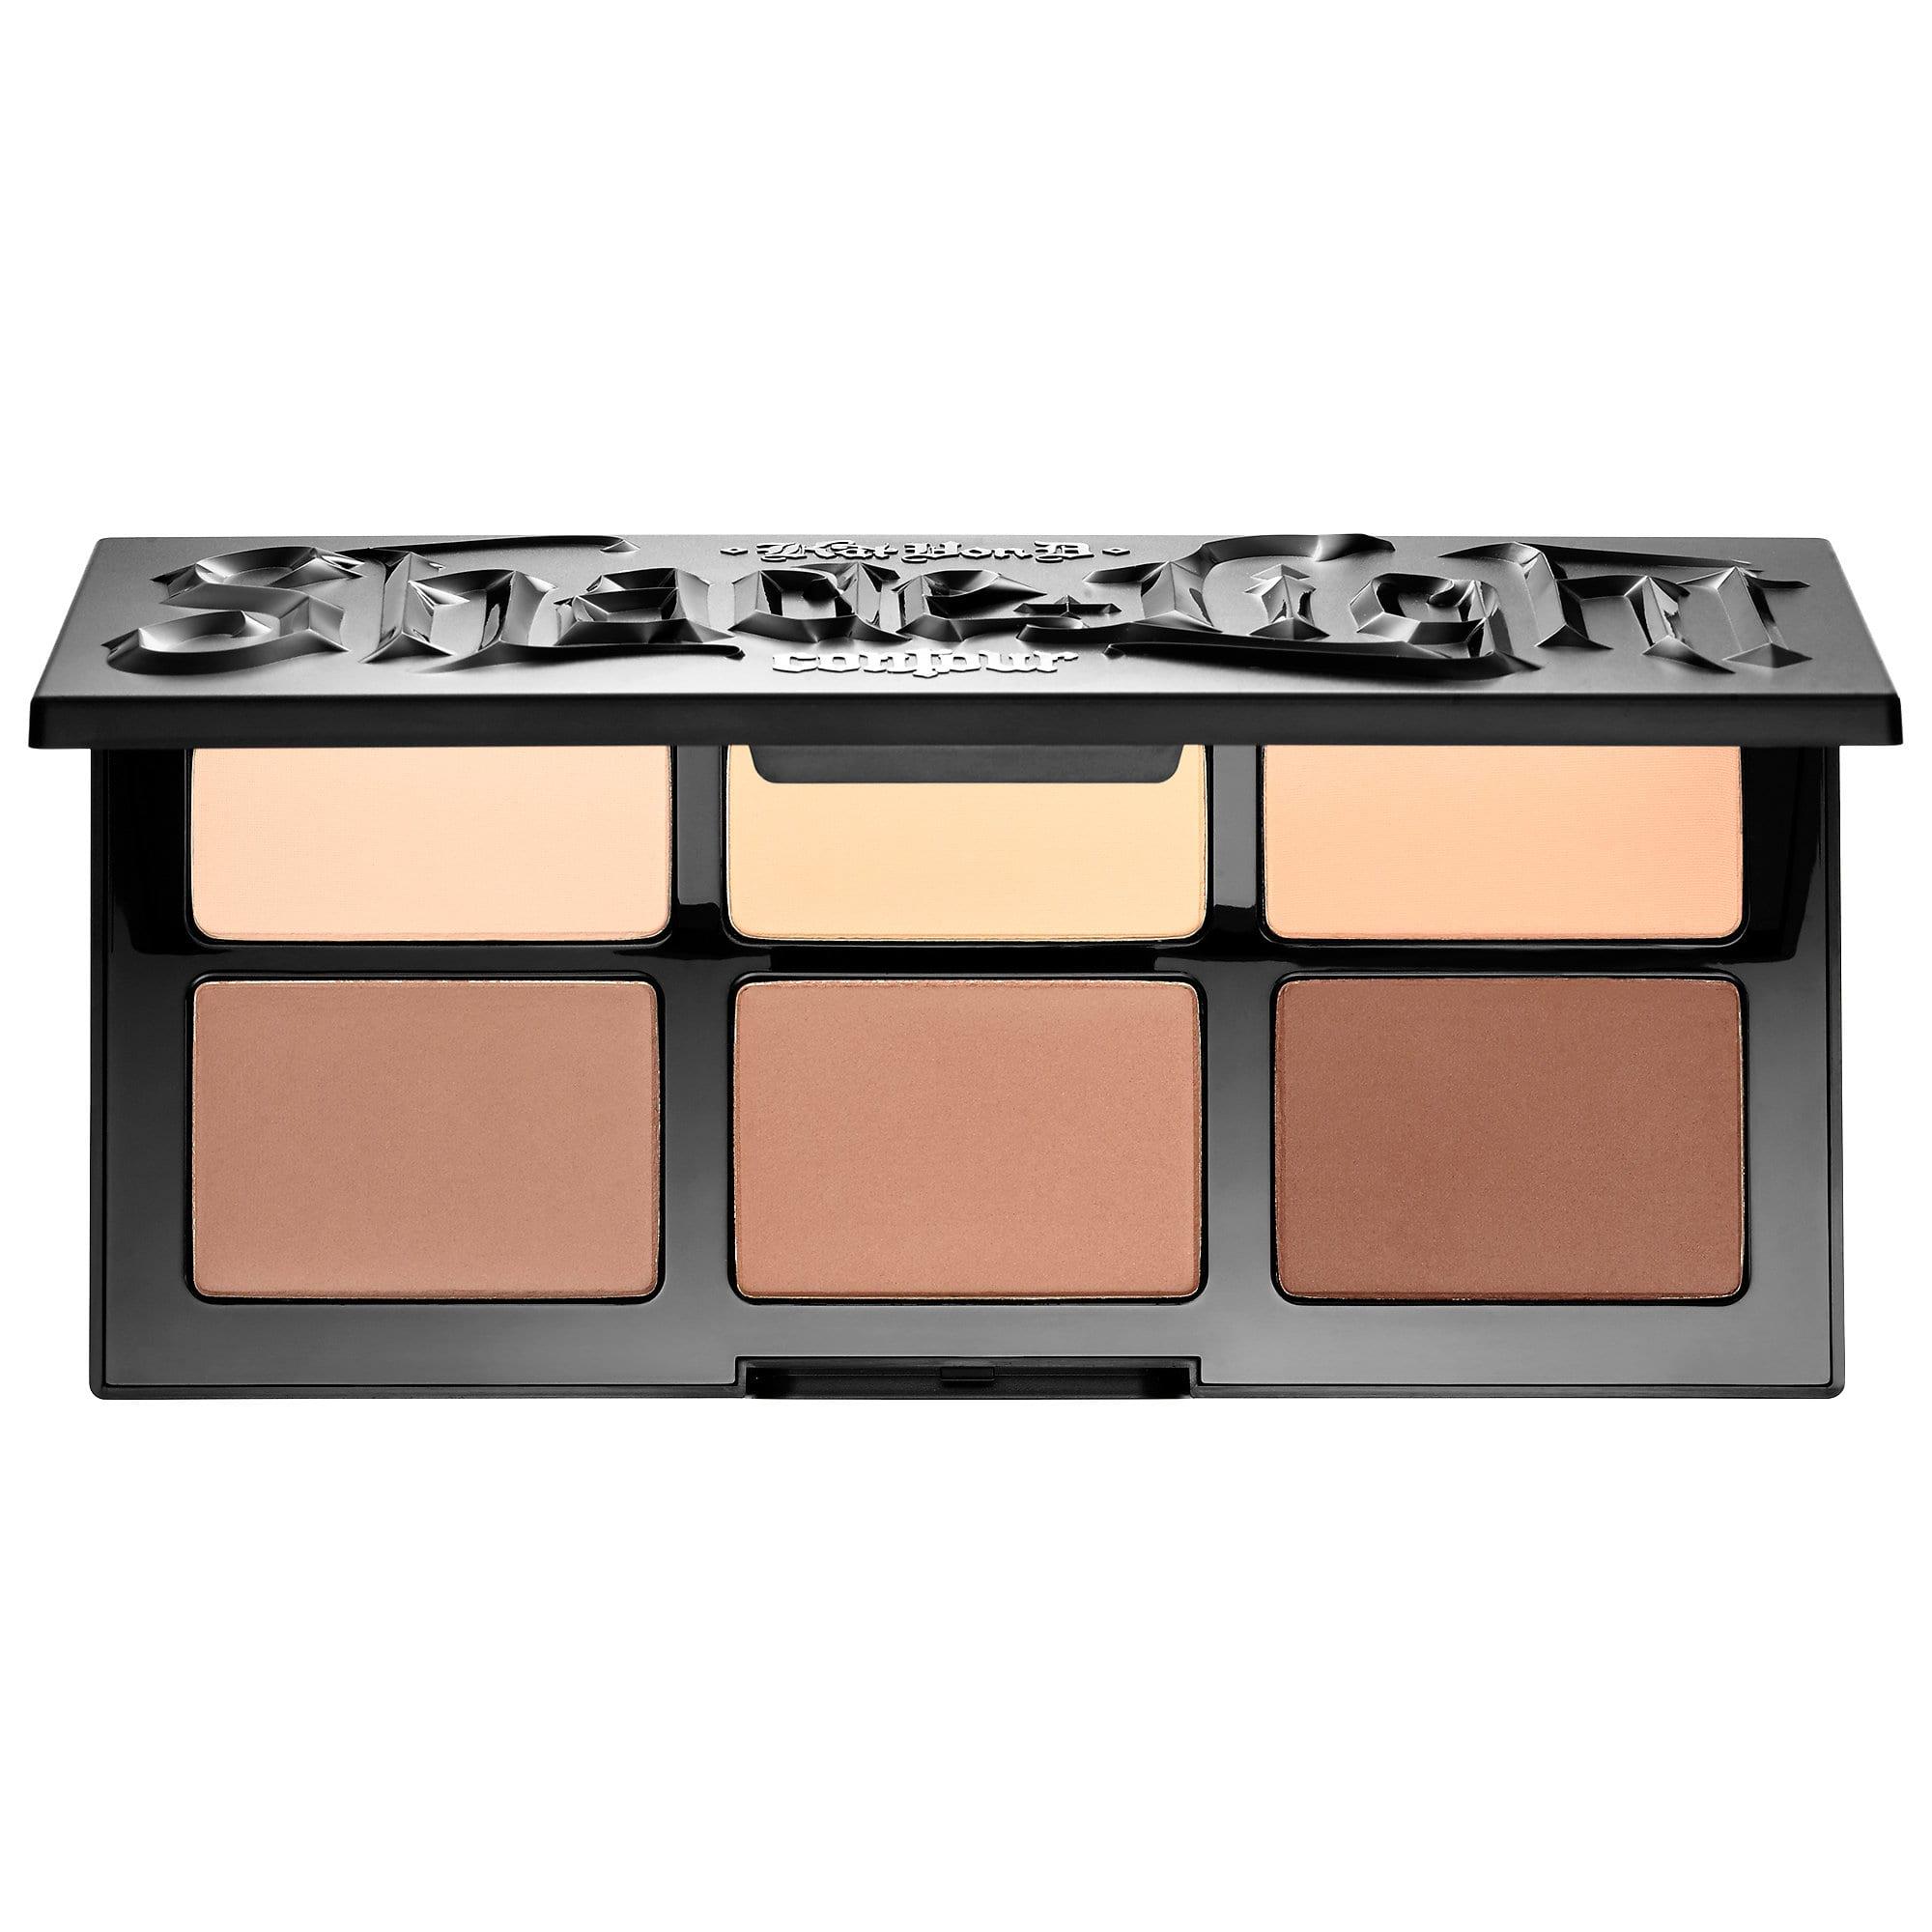 Shade Light Face Contour Refillable Palette Kvd Vegan Beauty Sephora Face Contouring Makeup Products Sephora Top Makeup Products